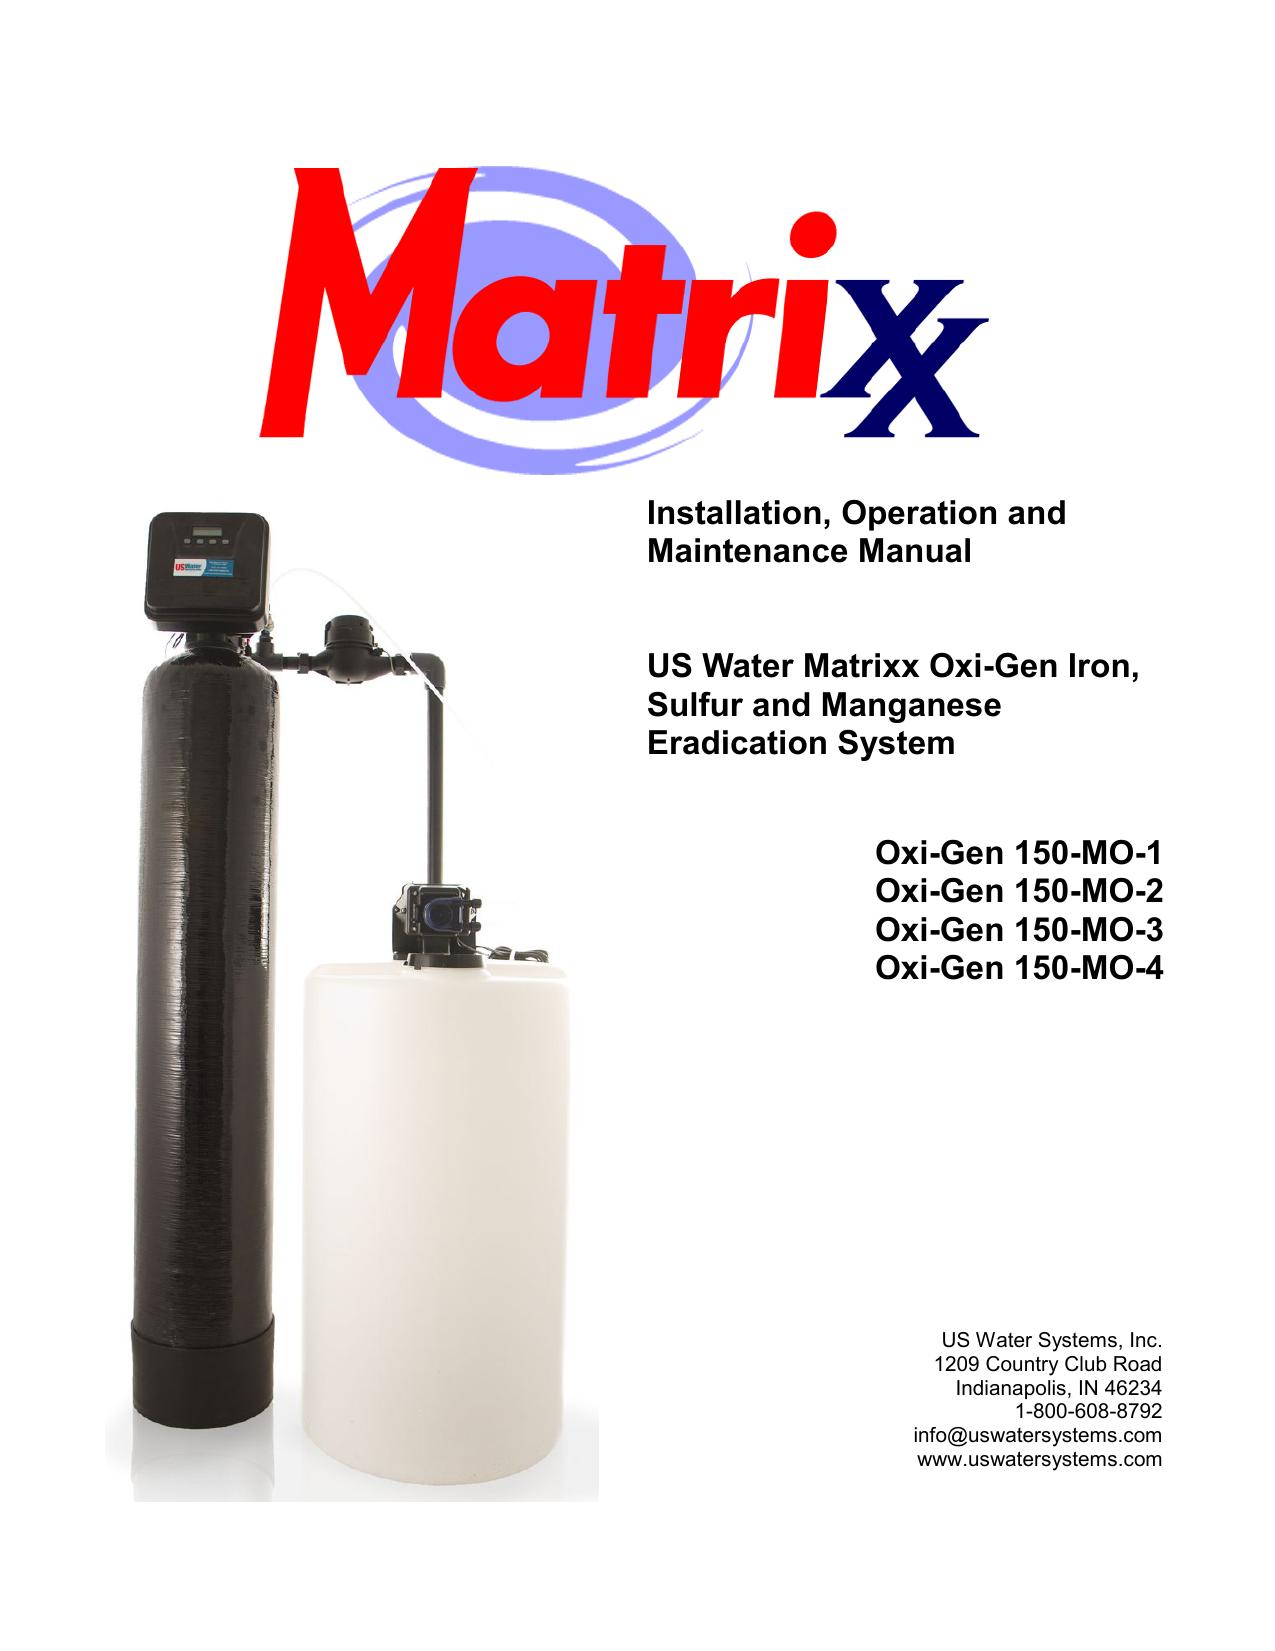 Installation, Operation and Maintenance Manual US Water Matrixx